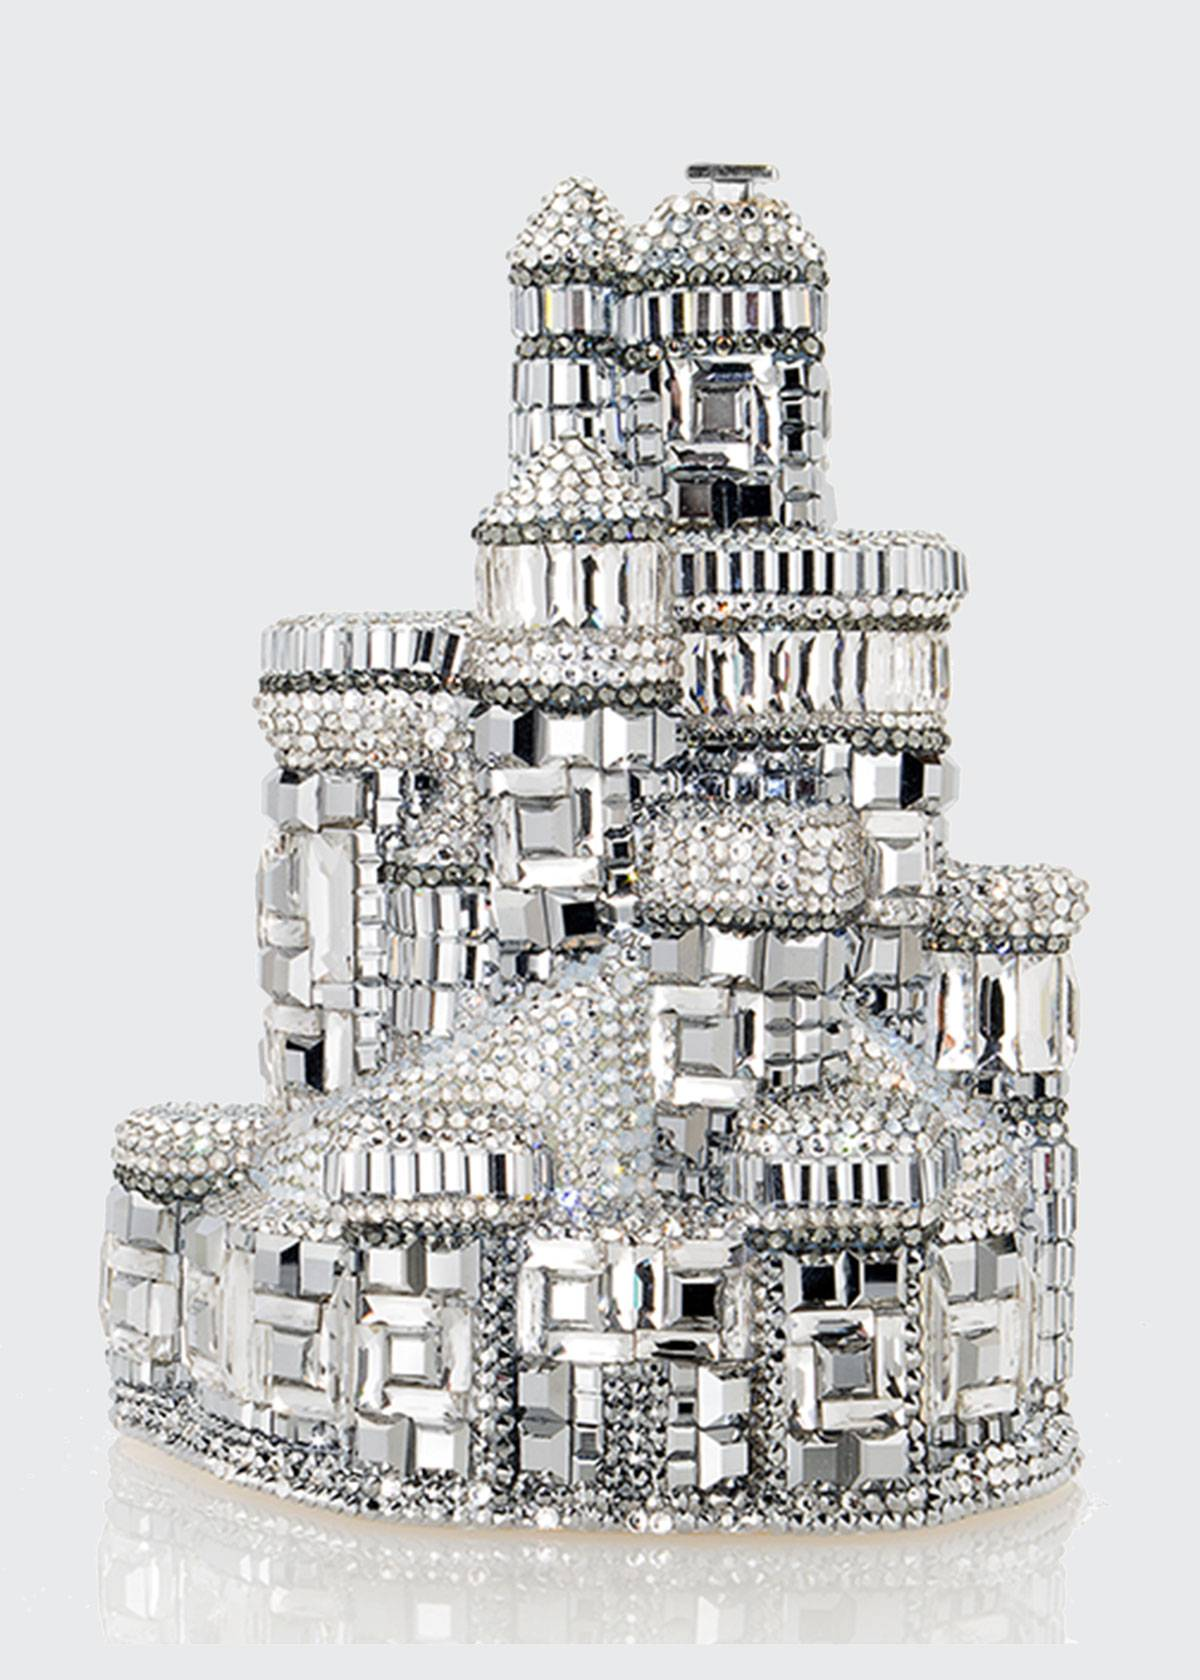 Judith Leiber Couture Schloss Castle Crystal Clutch Bag  - female - SILVER RHINE MULT